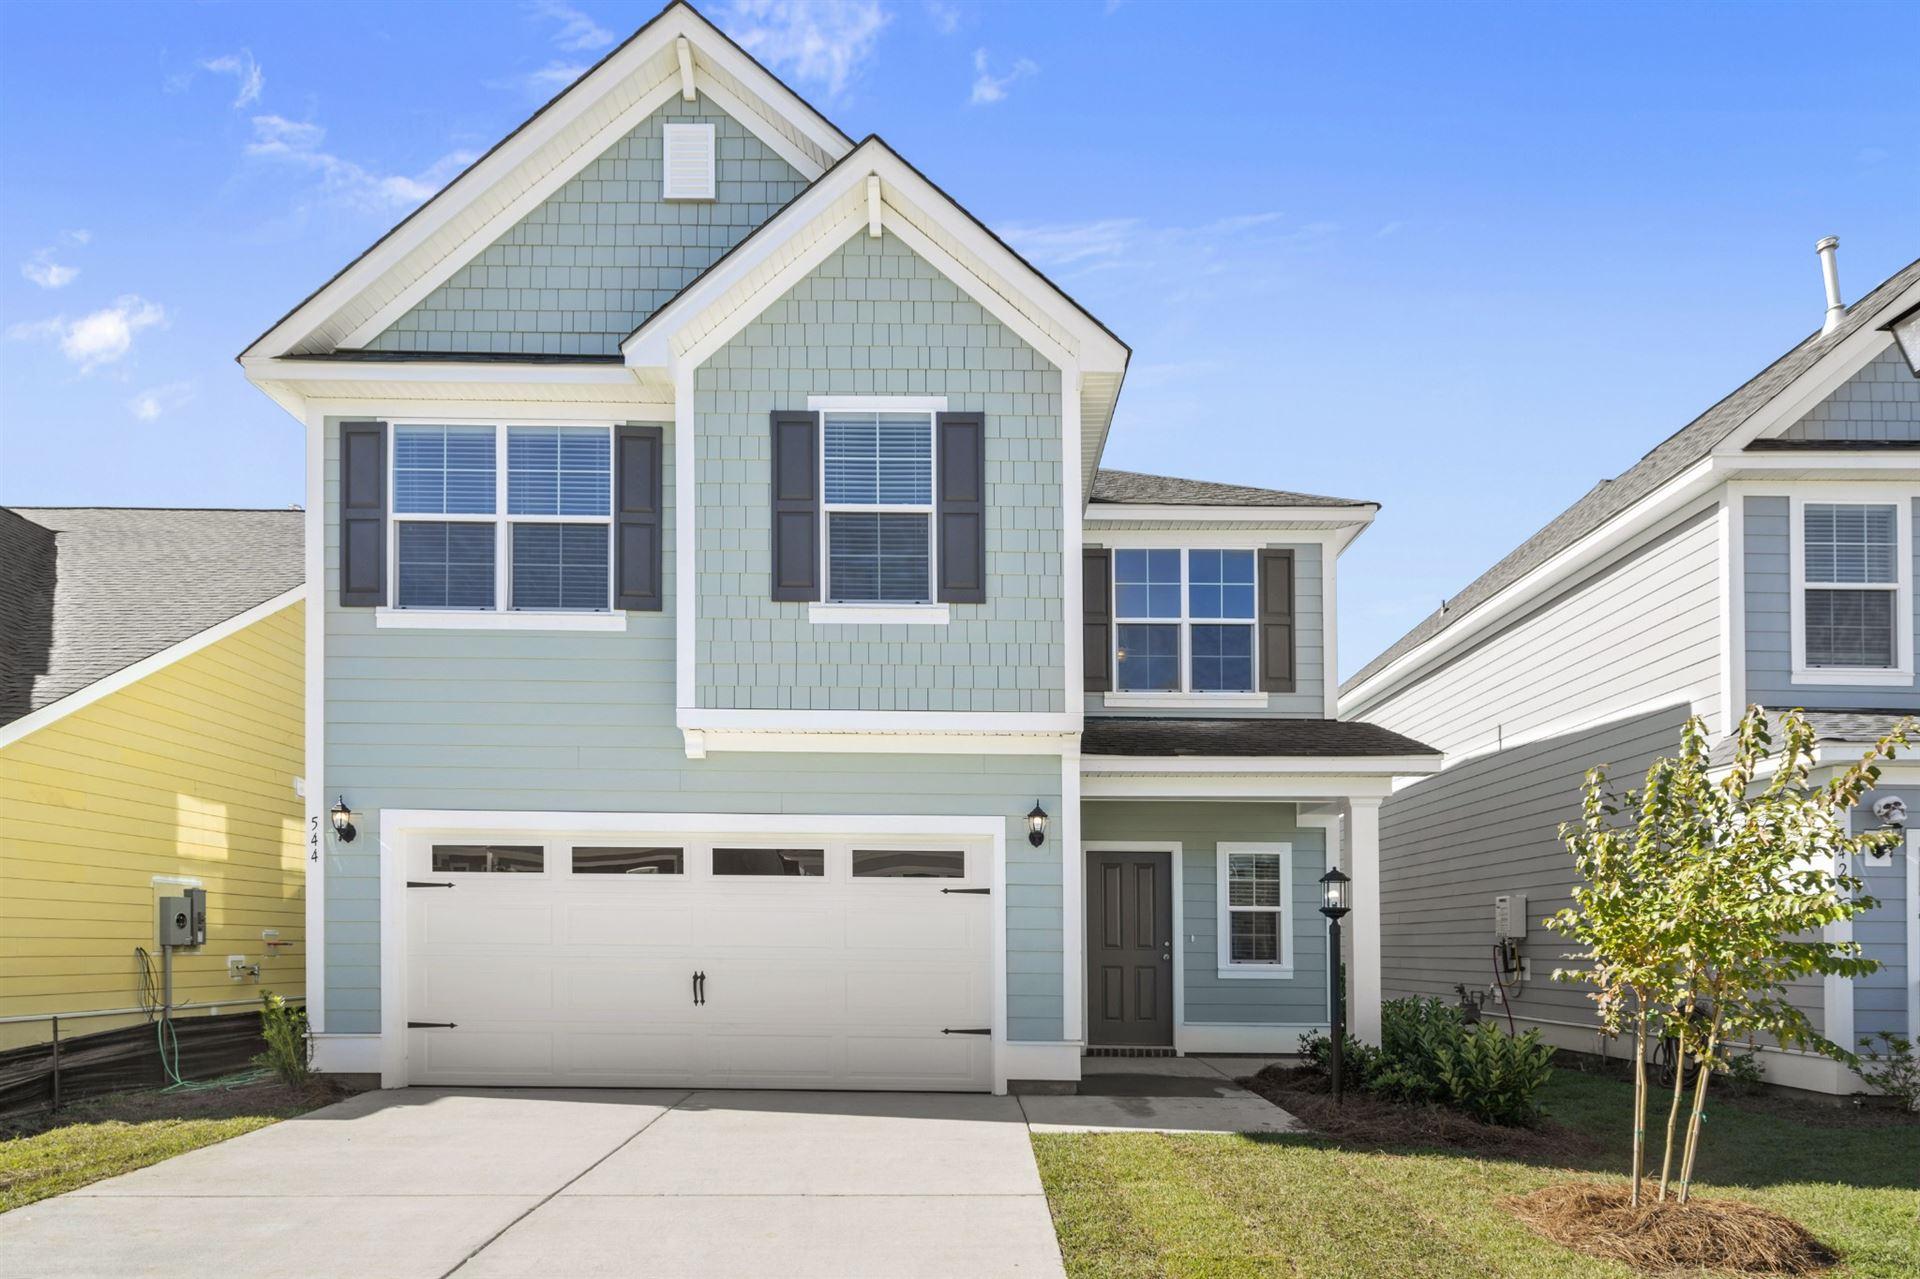 3534 Lafave Ln, Murfreesboro, TN 37129 - MLS#: 2251545